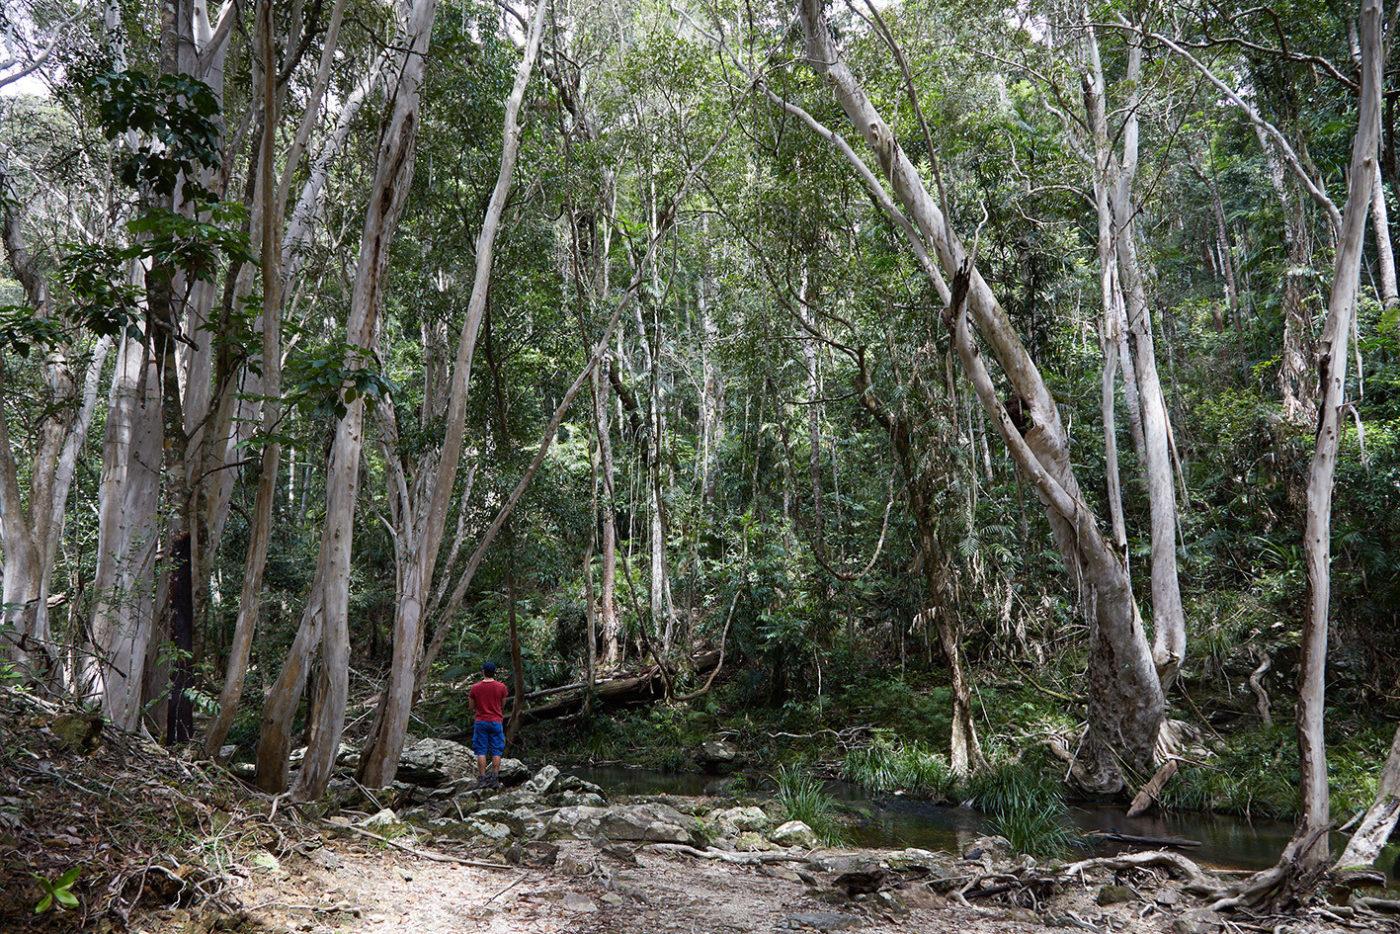 Barron Gorge; surprise creek walk, Nationalpark; National Park; Miles and Shores; Reiseblog; Travelblog; Australien; Roadtrip; Australien Roadtrip; Rundreise; wandern